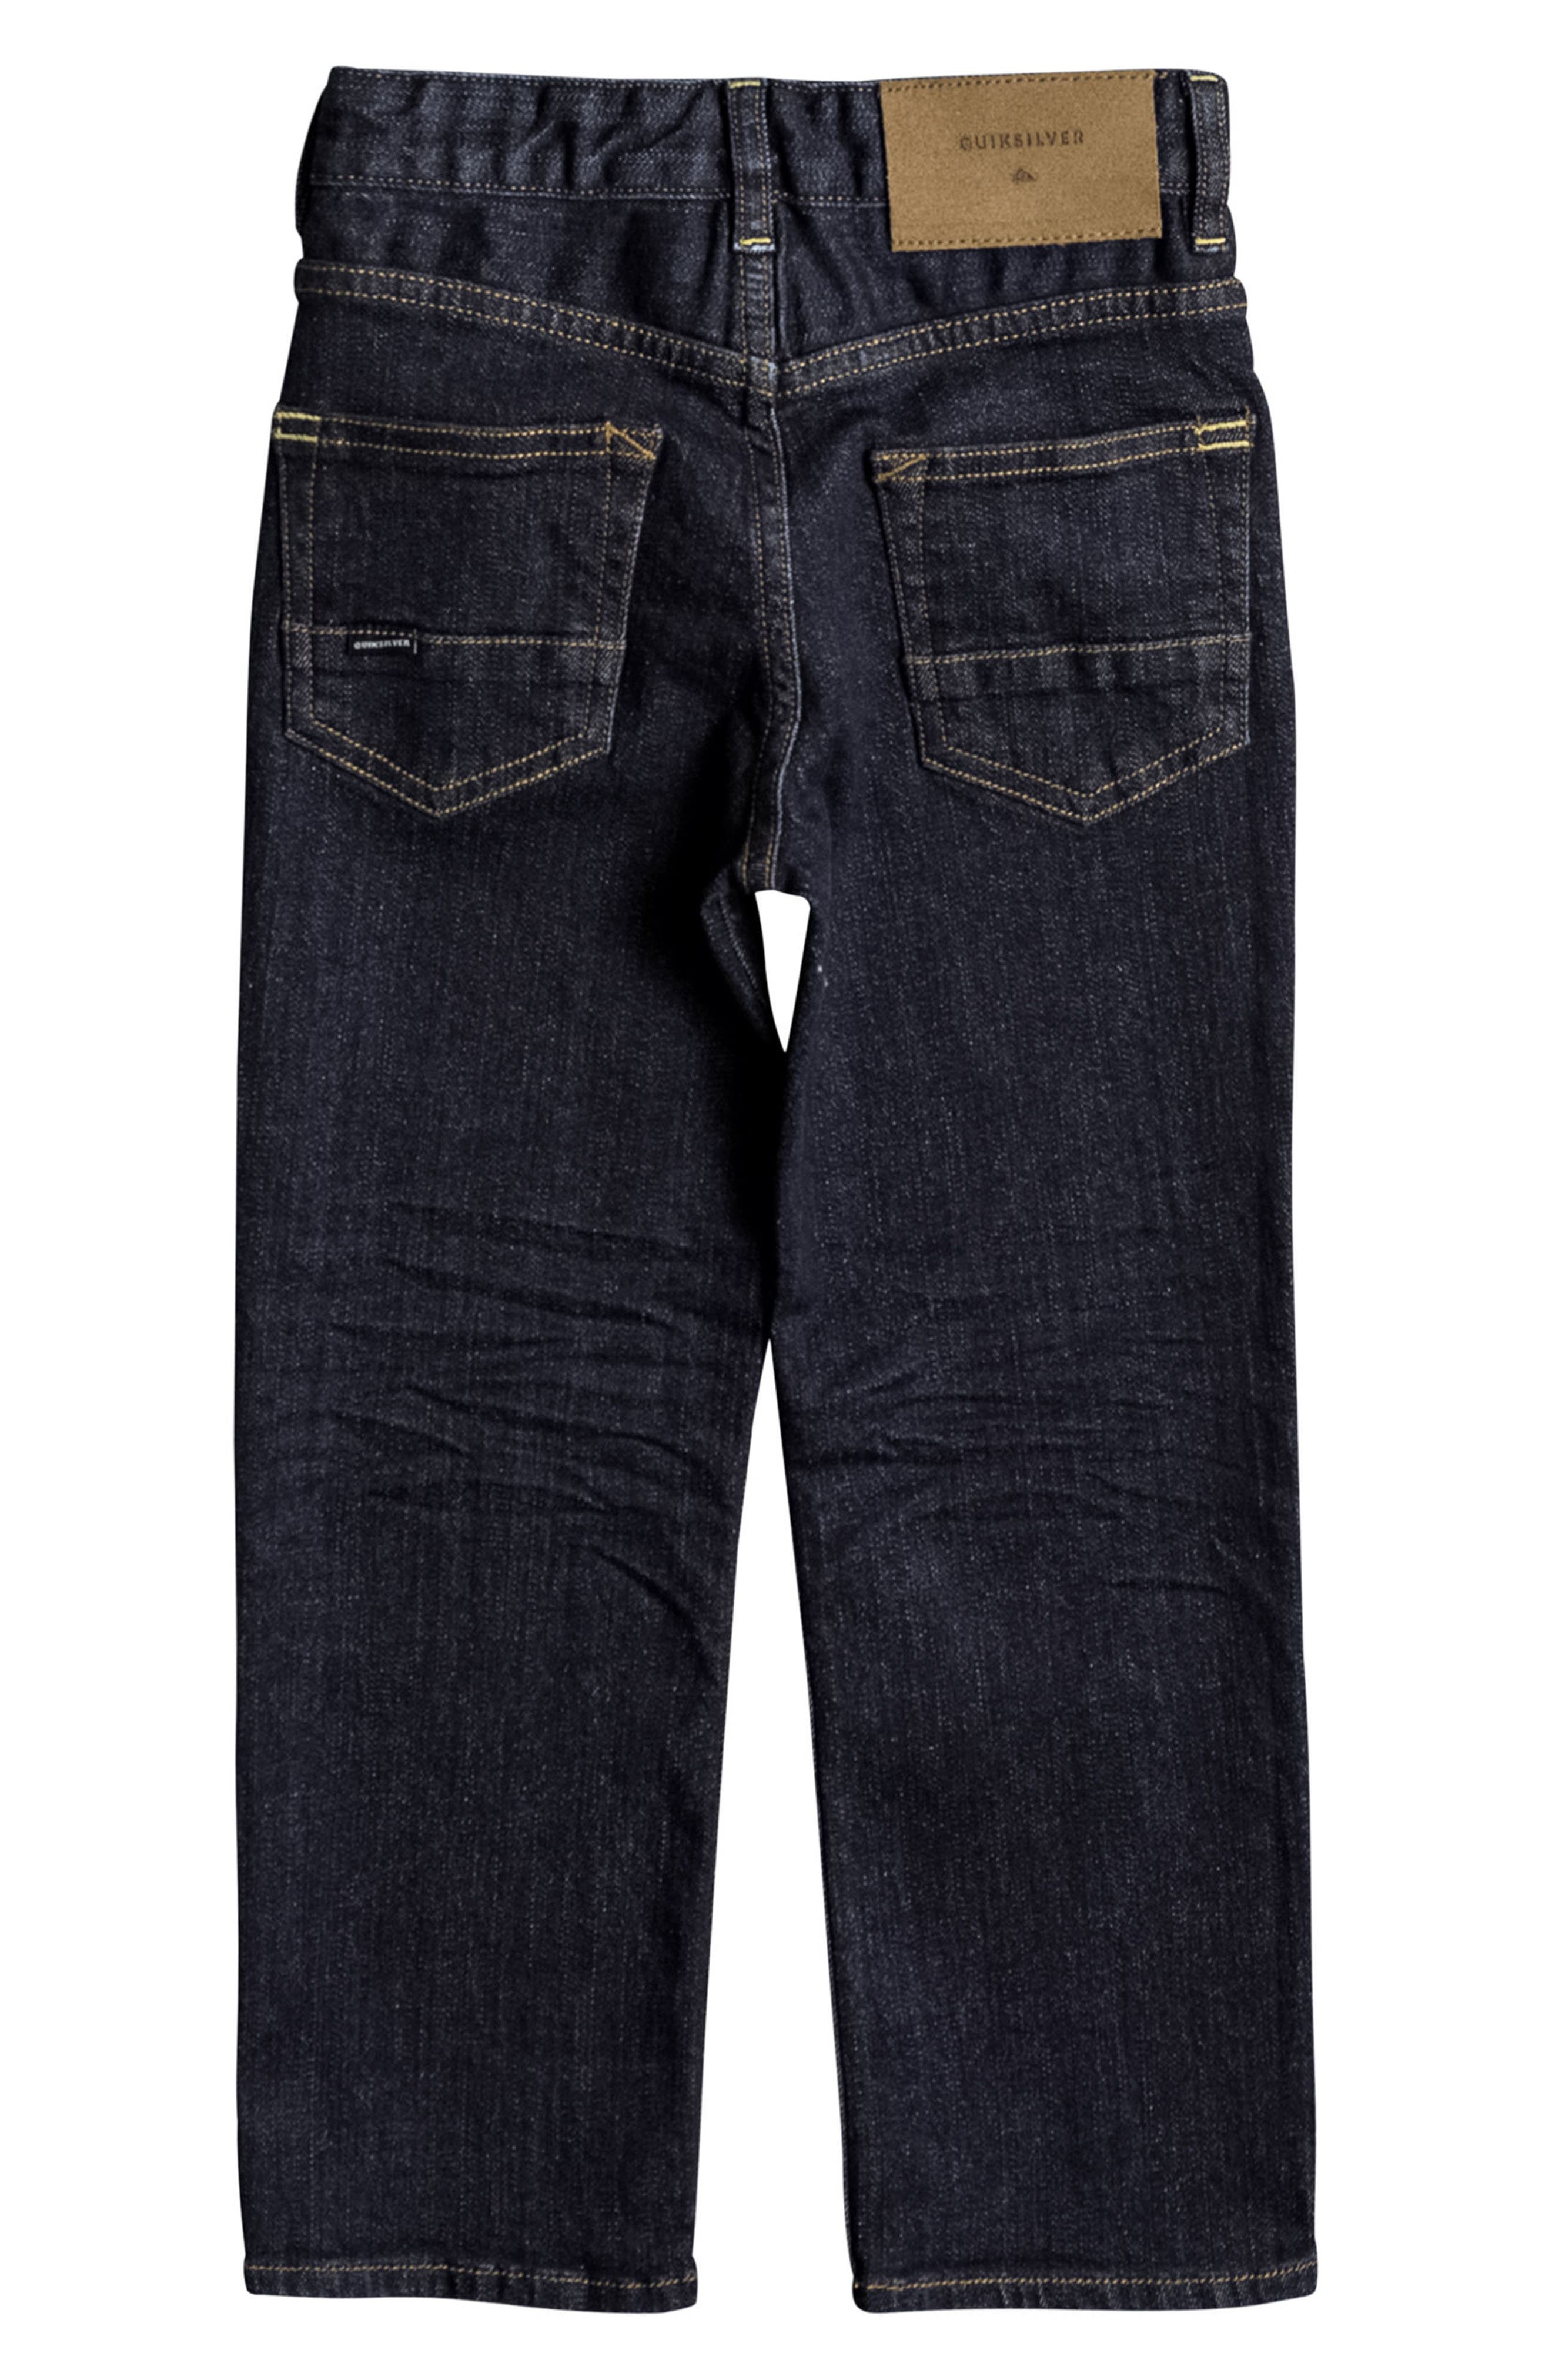 Alternate Image 2  - Quiksilver Sequel 5-Pocket Jeans (Big Boys)